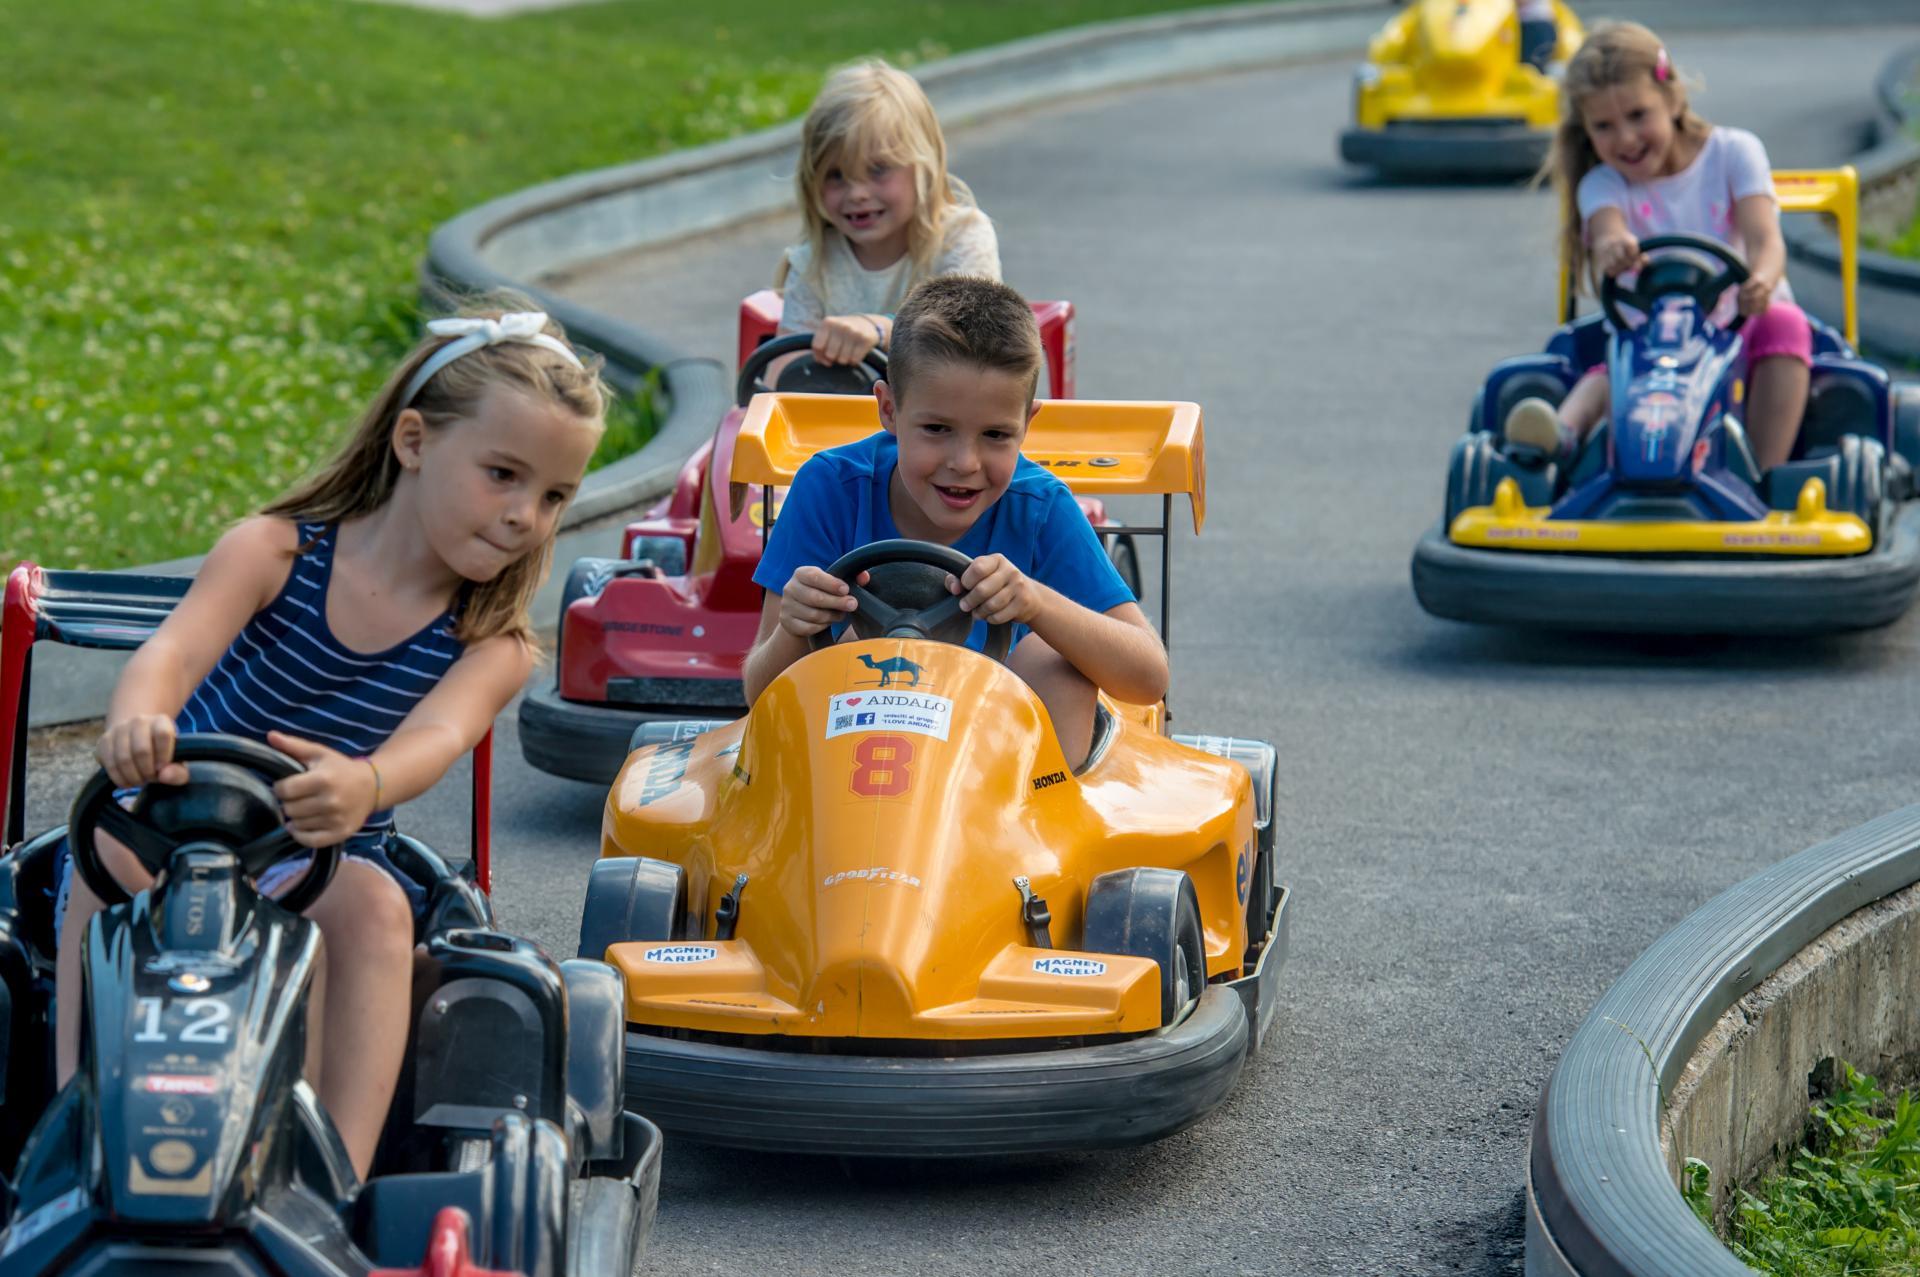 2016_PHMatteoDeStefano_Andalo_bambini_giochi_montagna_family_baby_cars_kart_macchinine_parco_LifePark_Dolomiti_Paganella_Trentino_3.jpg